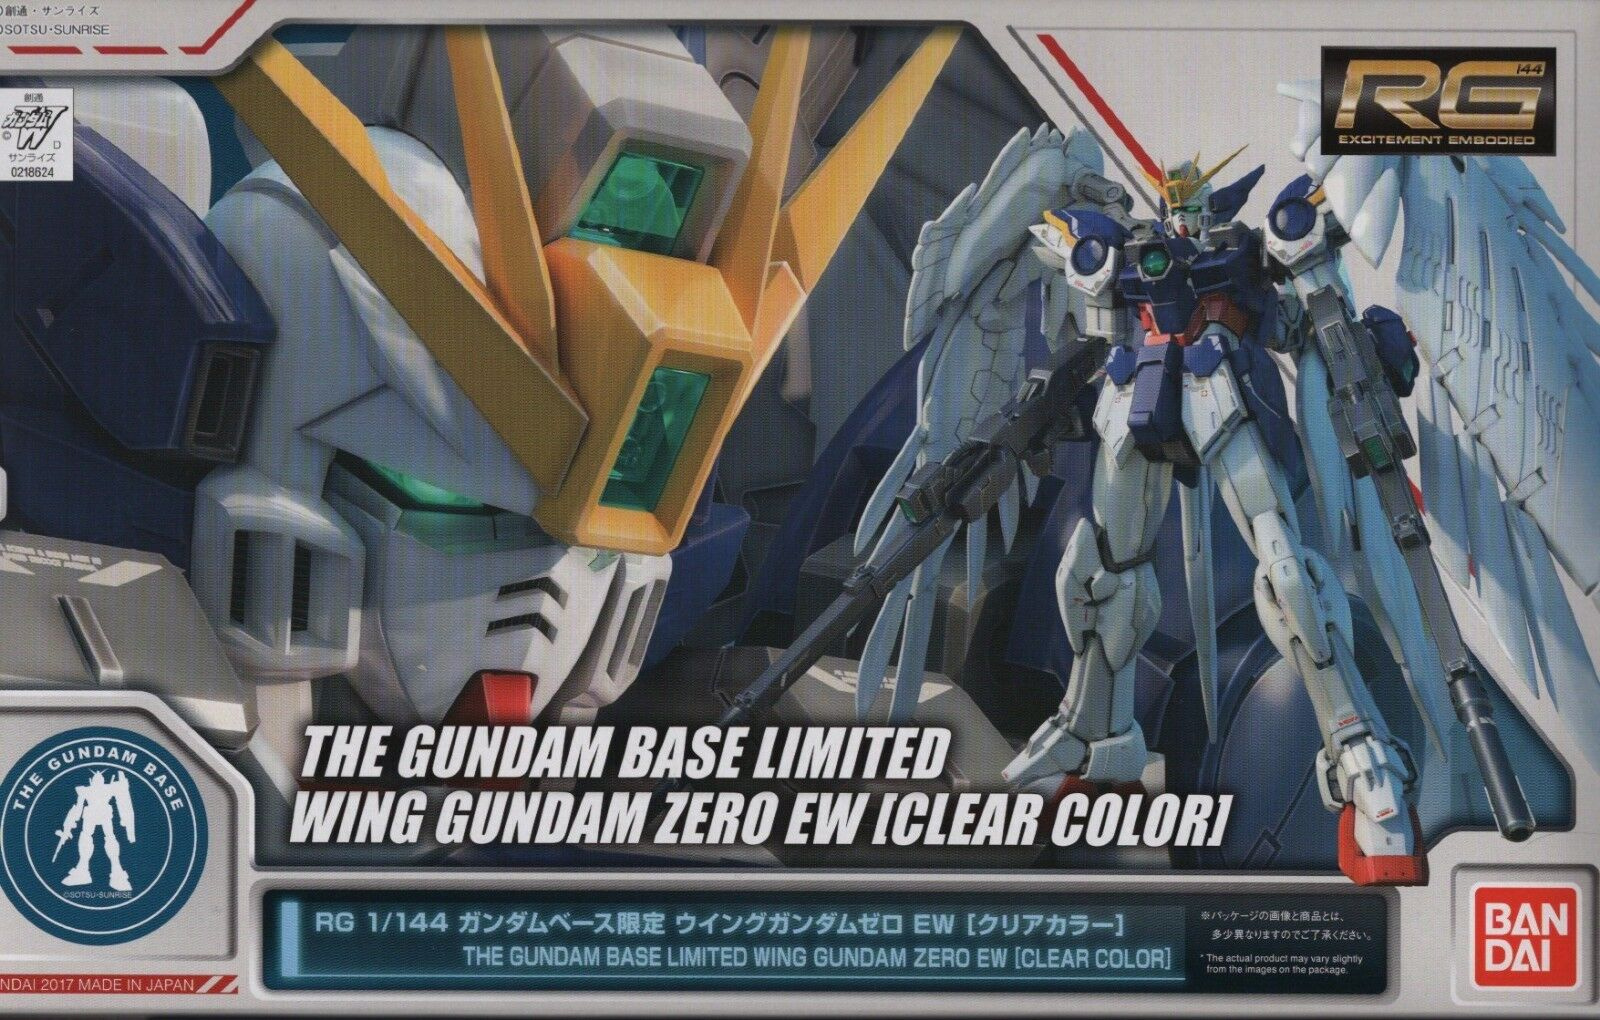 【BANDAI】Gundam Base Limited  Wing Gundam Zero EW (clear color) RG 1 144